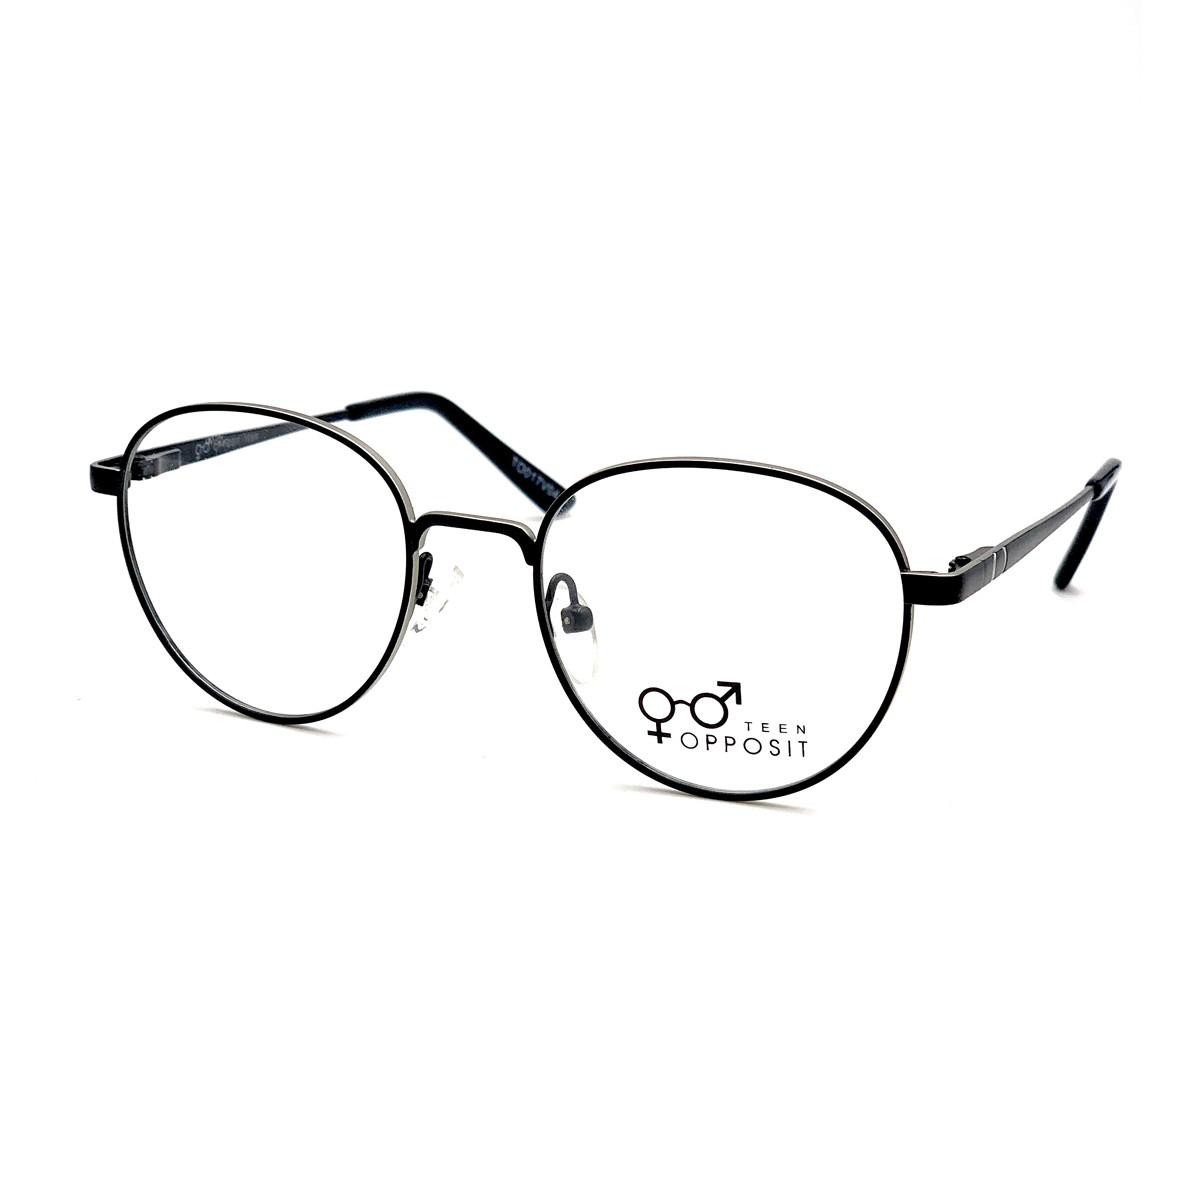 Opposit Teen TO017V Junior | Occhiali da vista Bambino